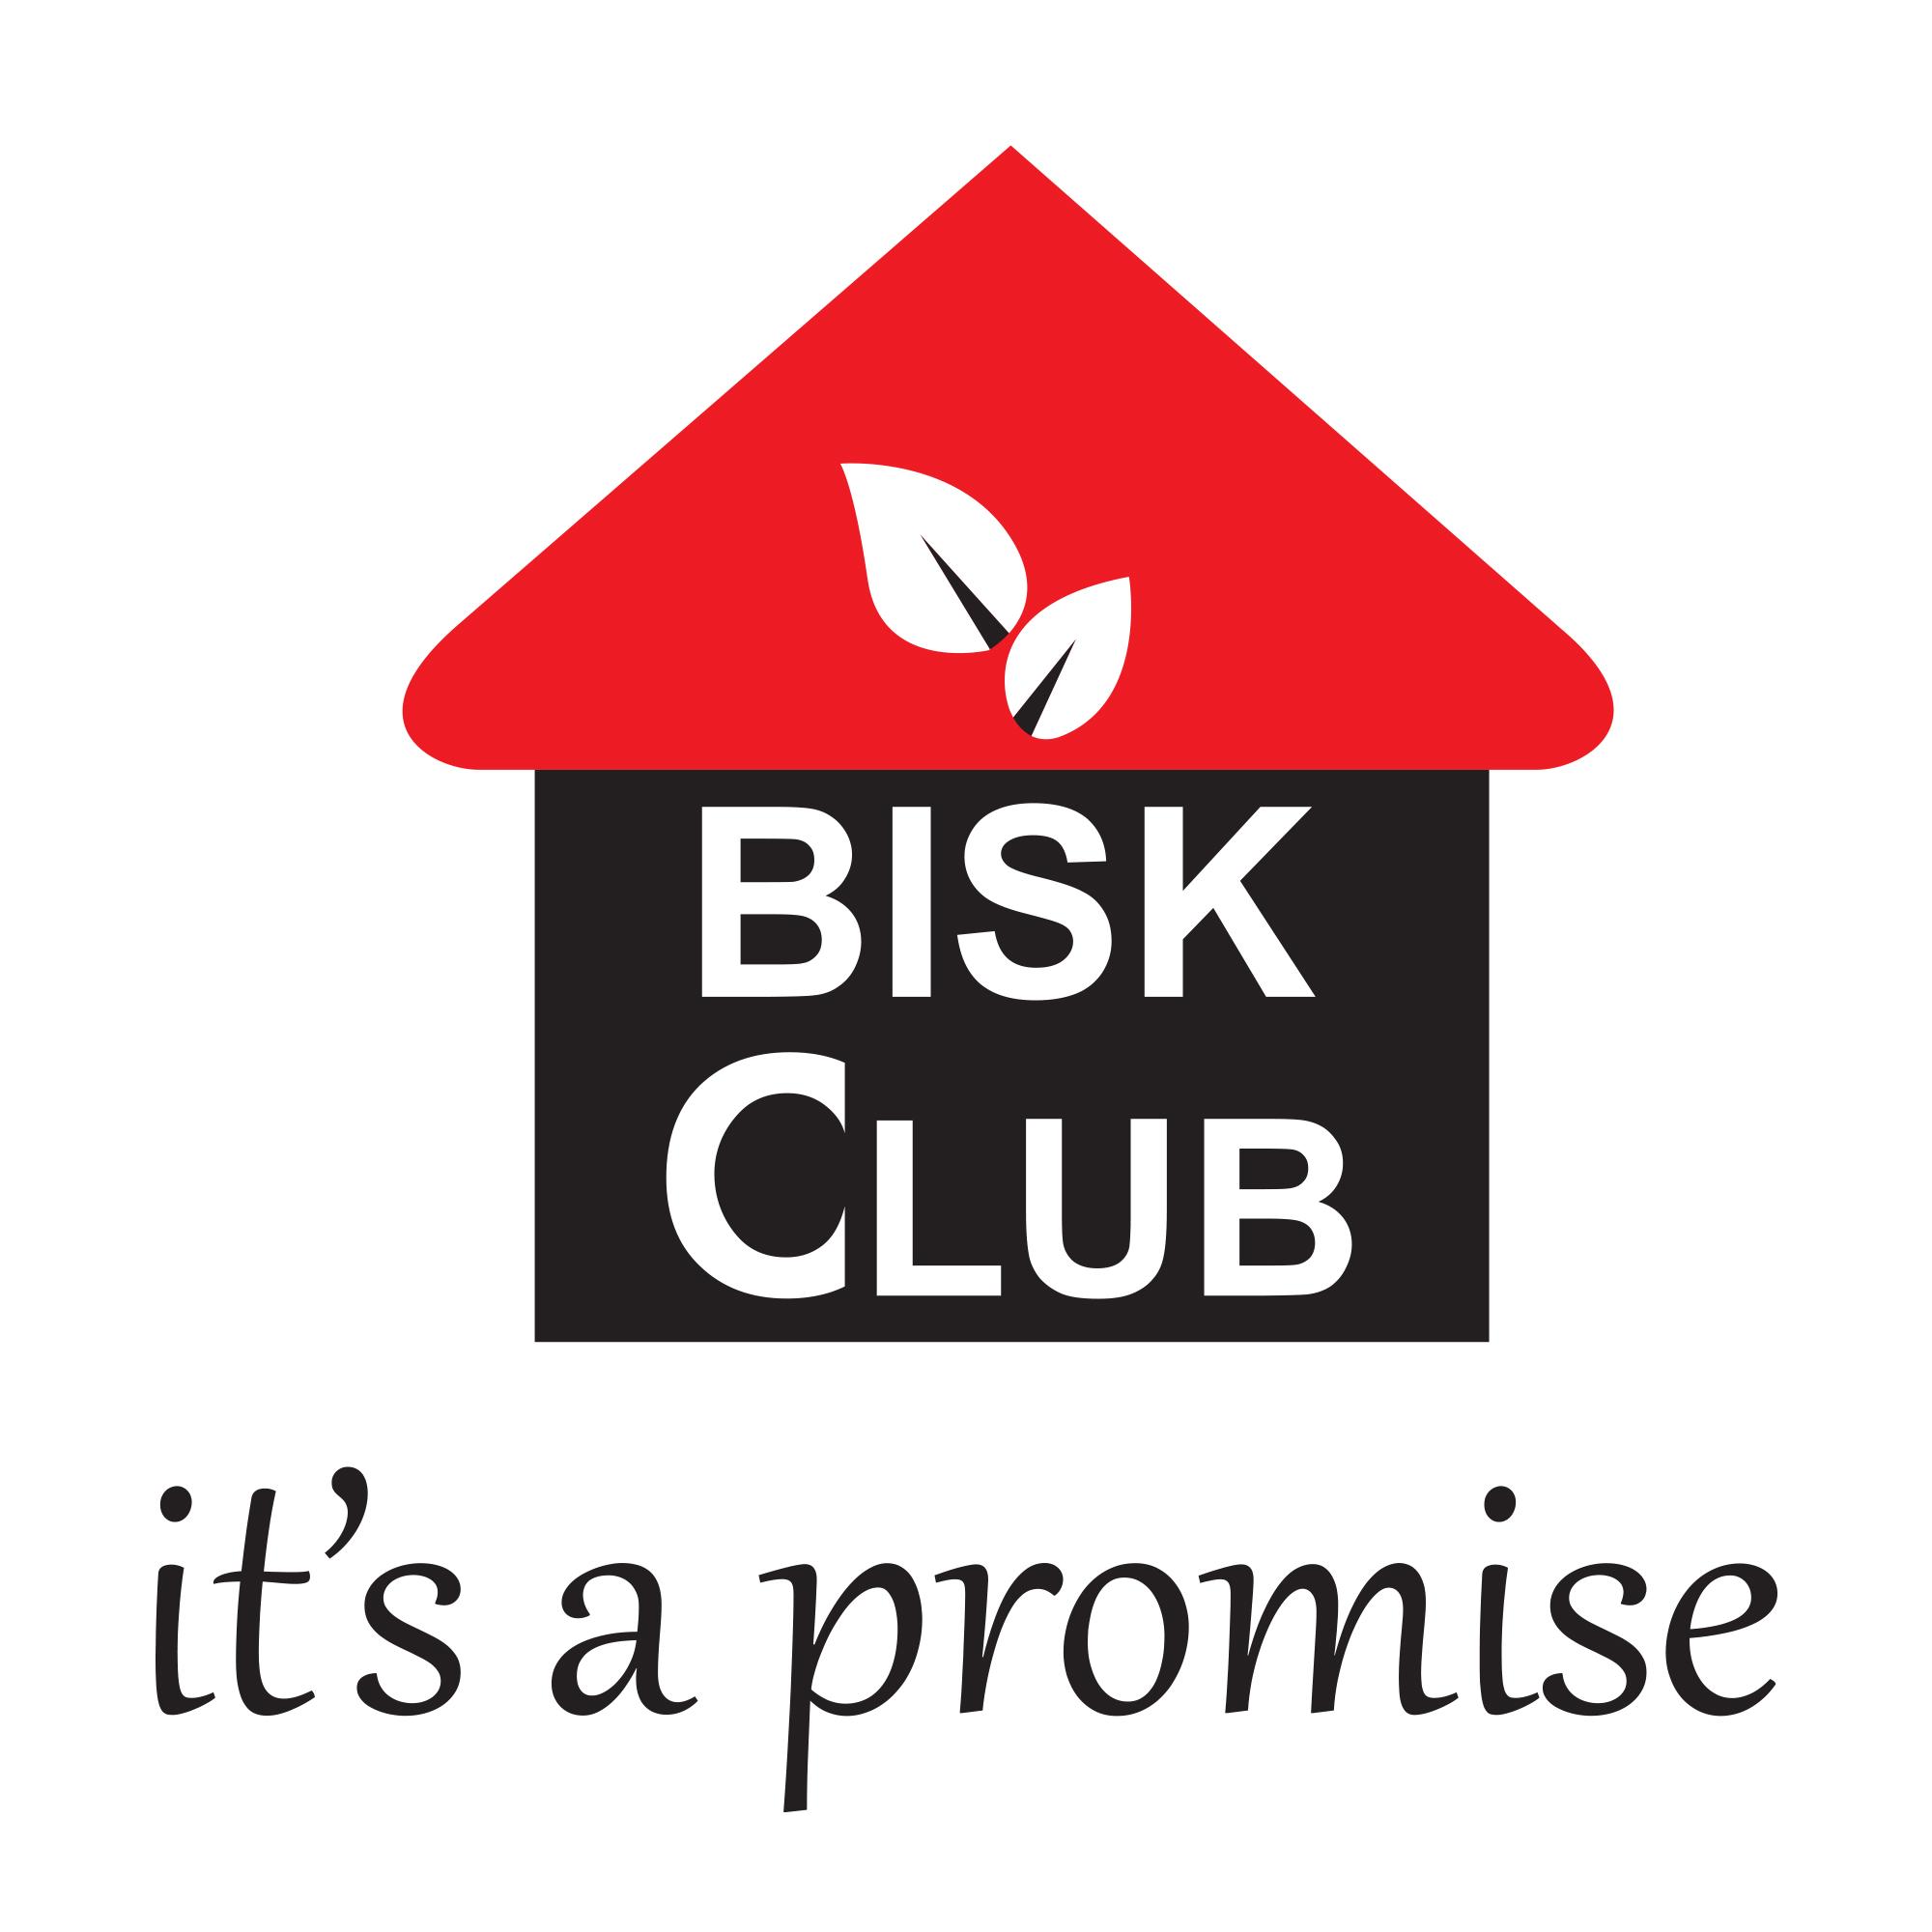 Bisk Club